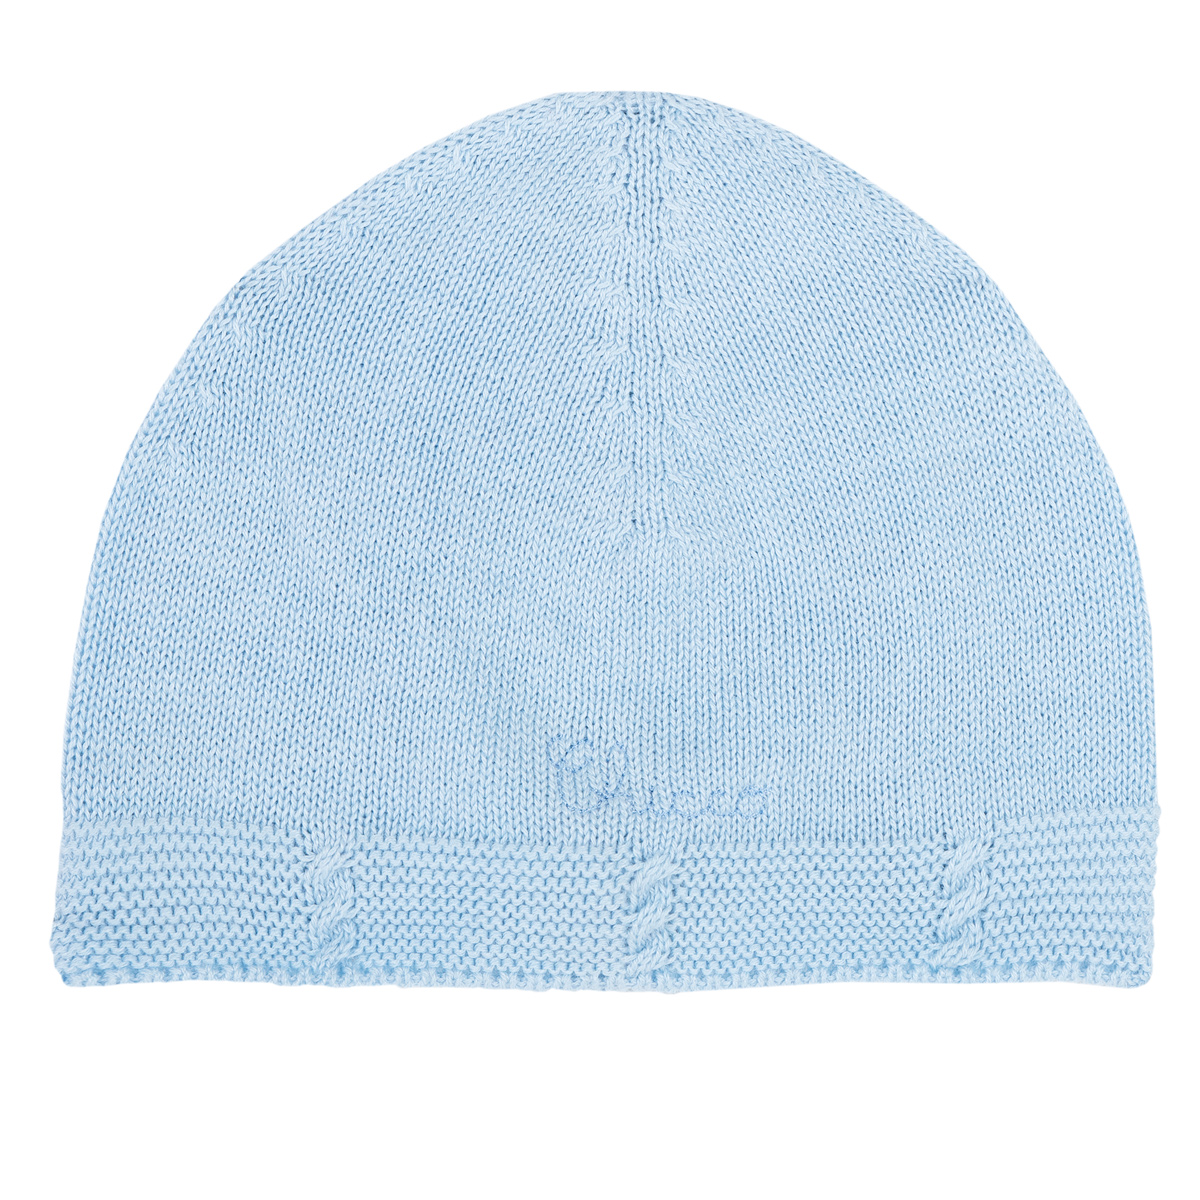 Caciula Bebe Tricotata Chicco, Albastru Cu Roz, 04616 imagine